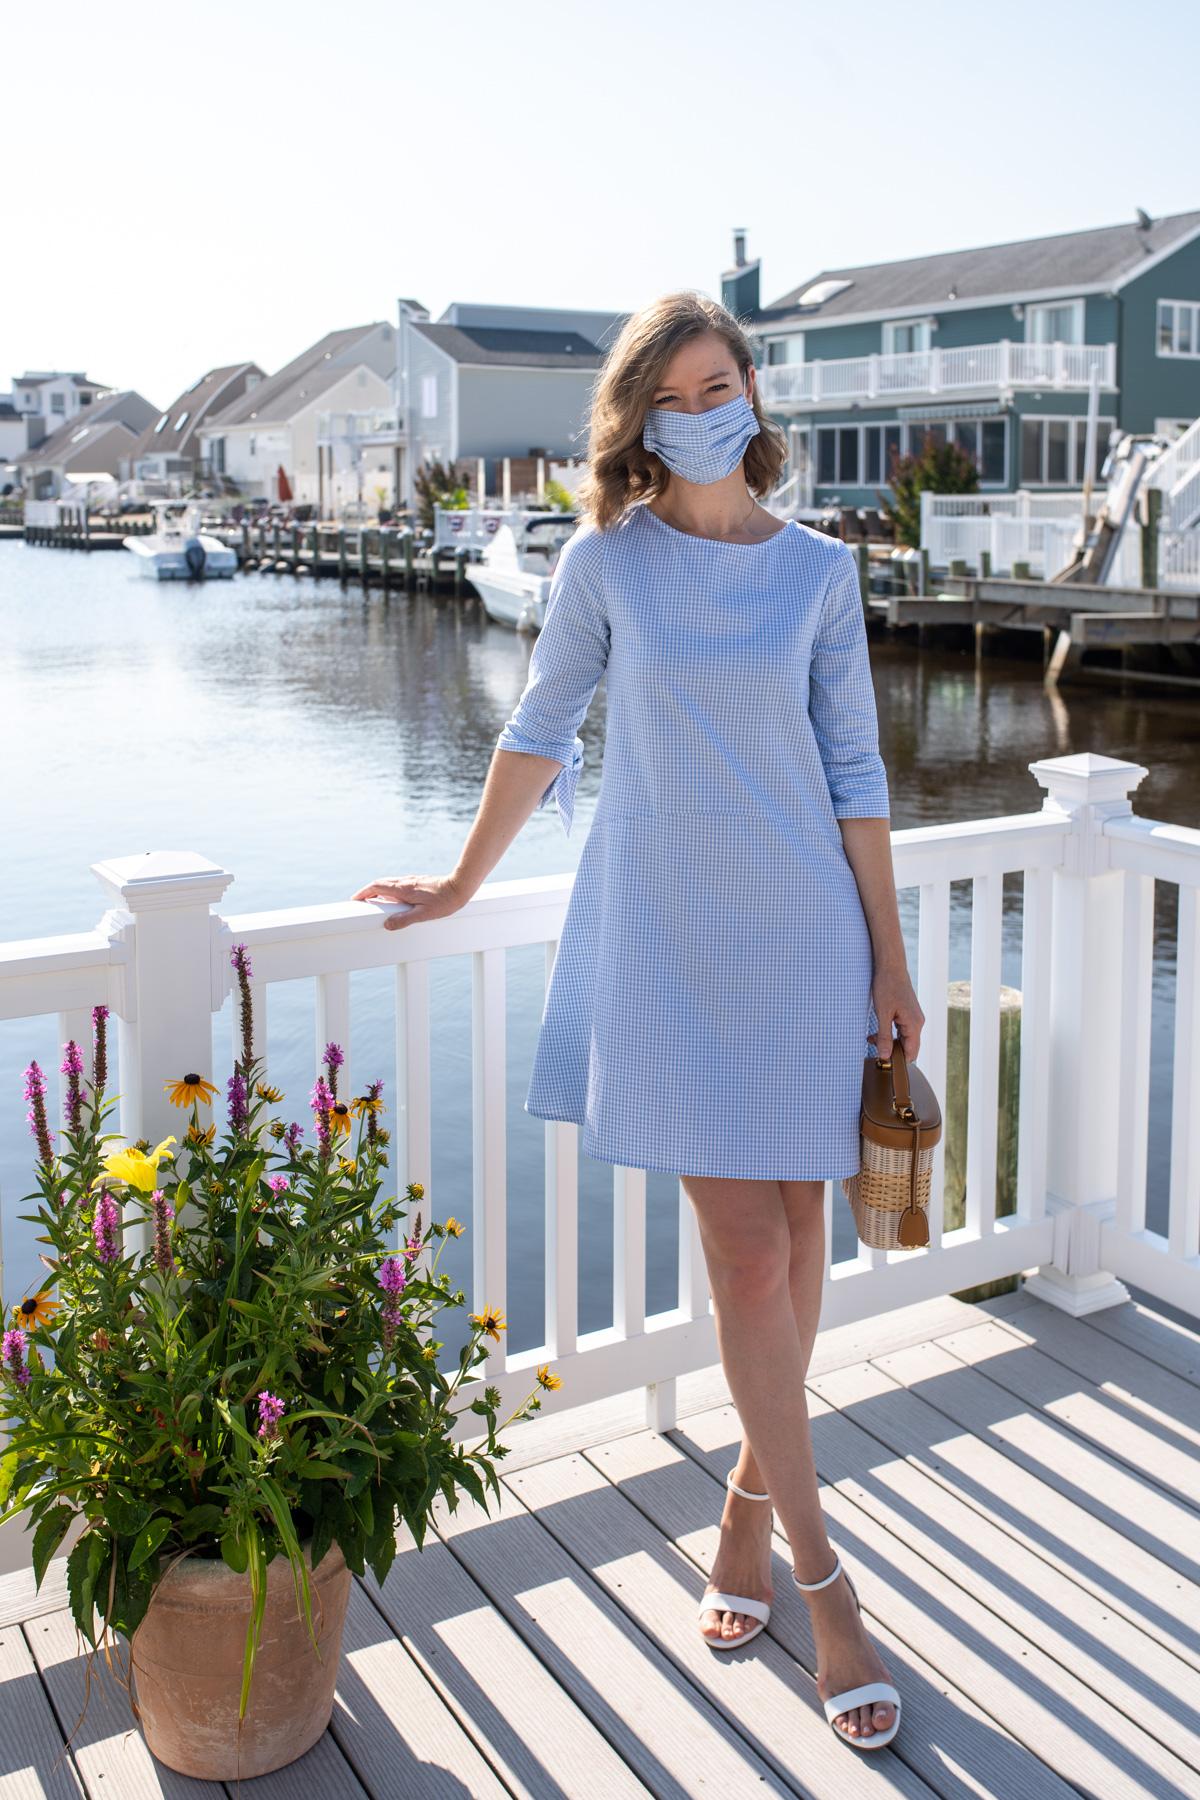 Stacie Flinner x Marta Scarampi Cotton Dress and Face mask-23.jpg